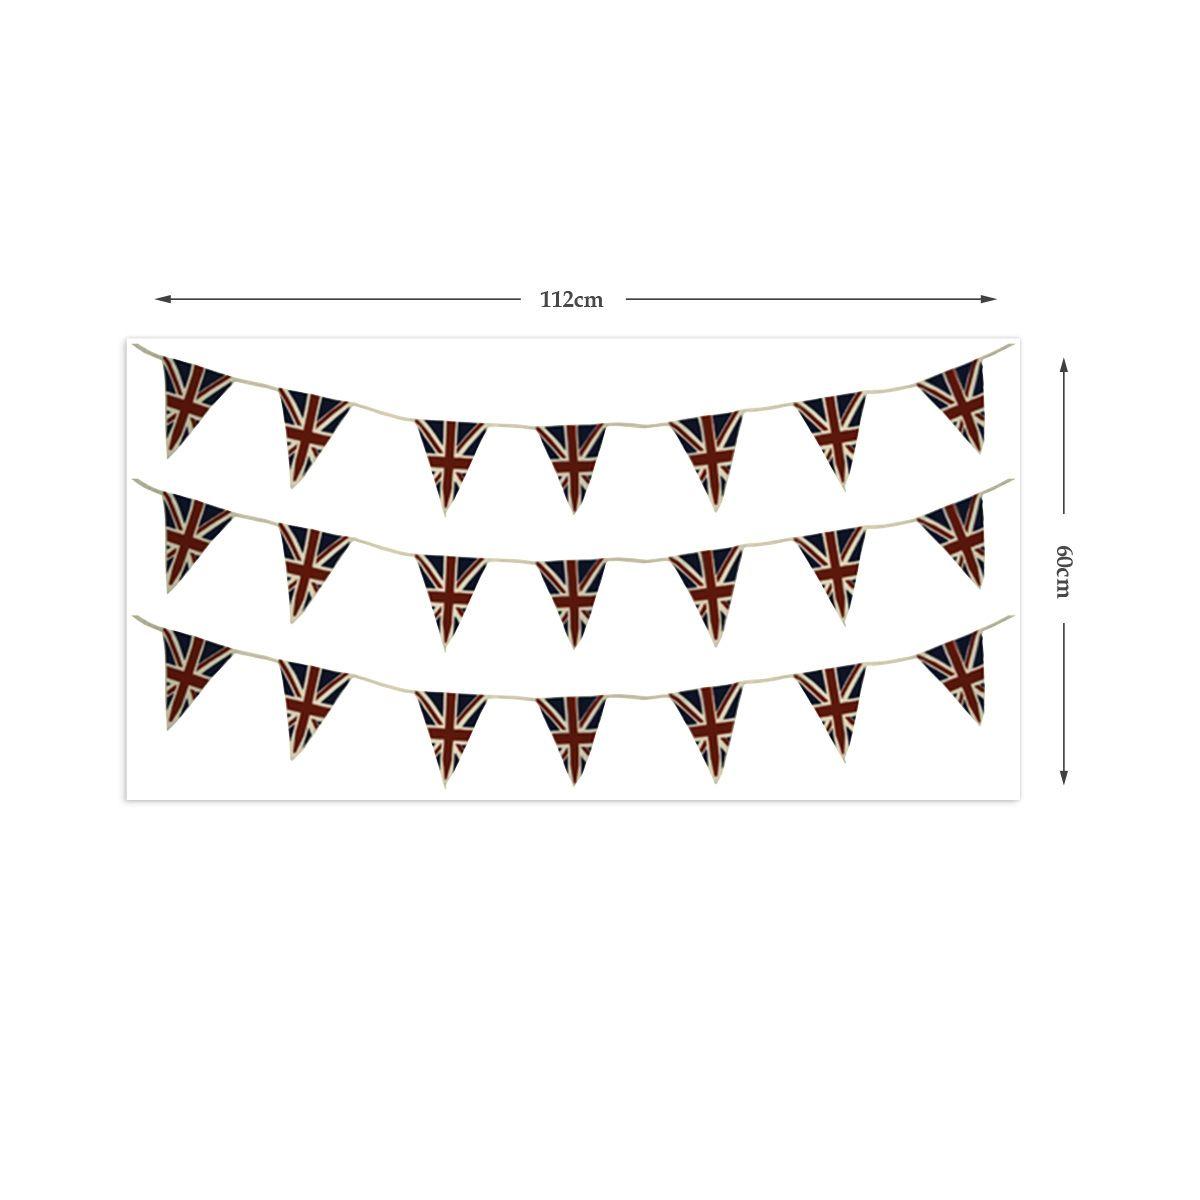 British Union Jack flag bunting wall stickers | Jack flag, Buntings ...